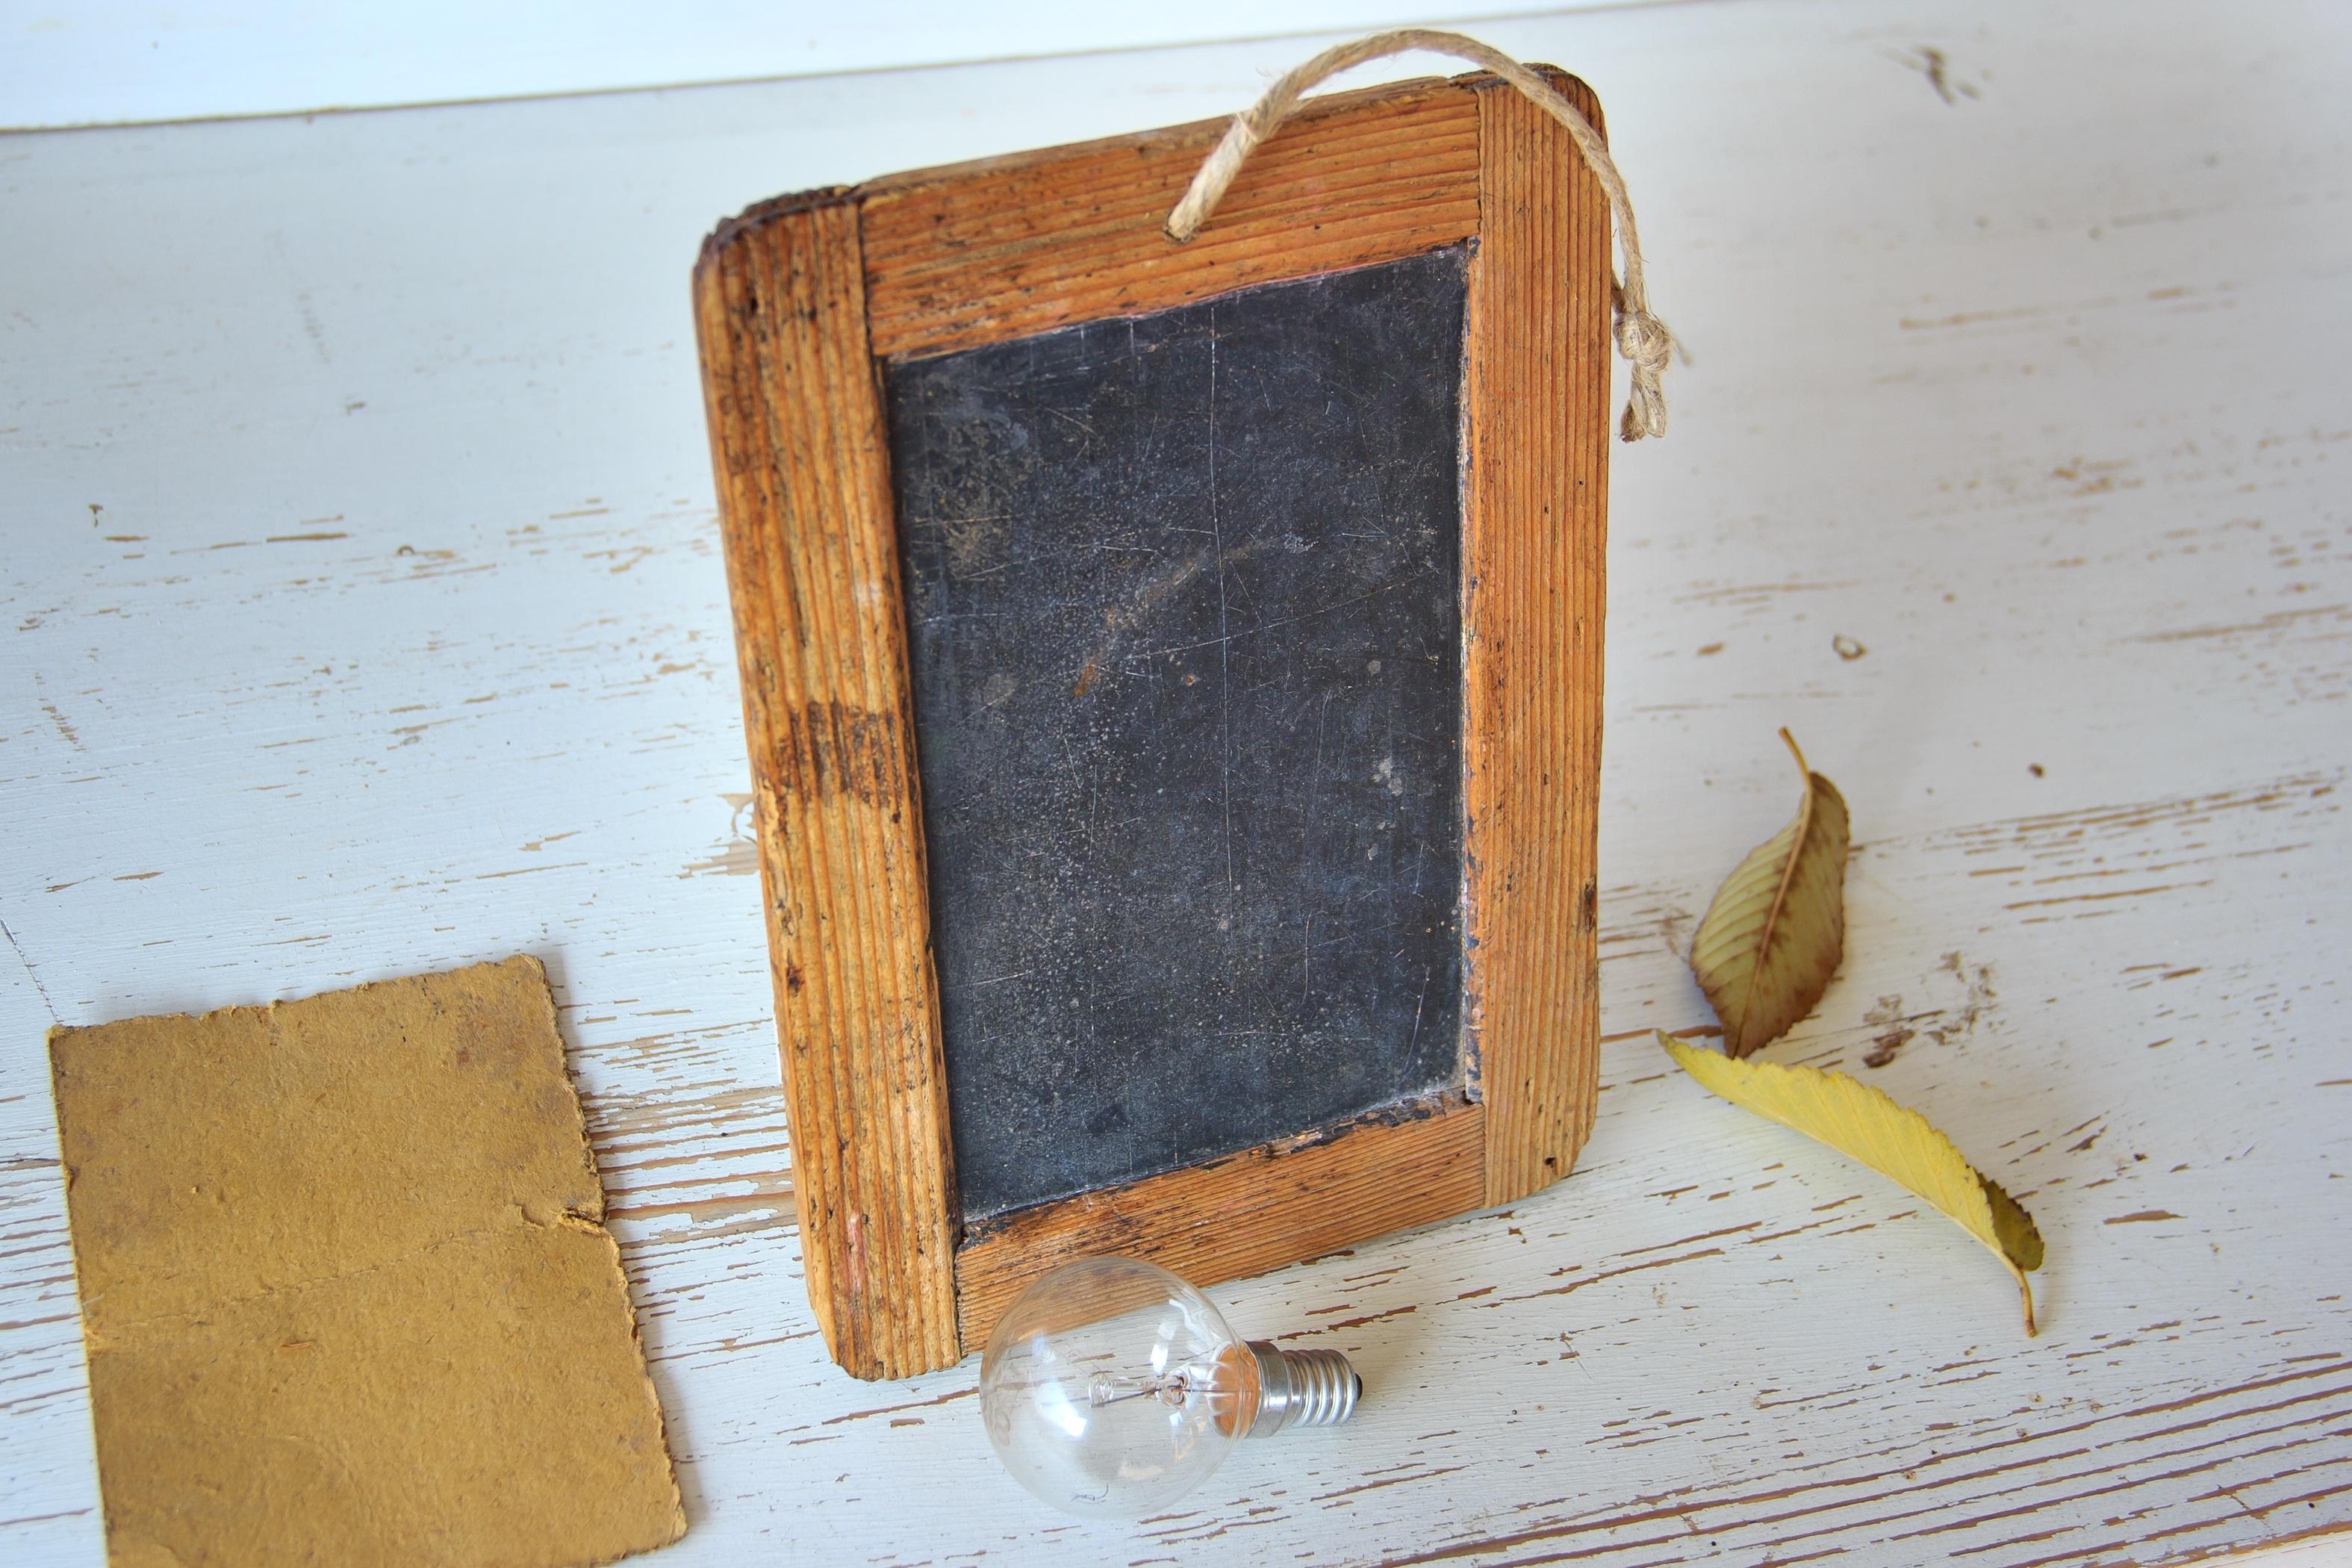 Kostenlose foto : lesen, Licht, Holz, Jahrgang, Blatt, alt, rustikal ...